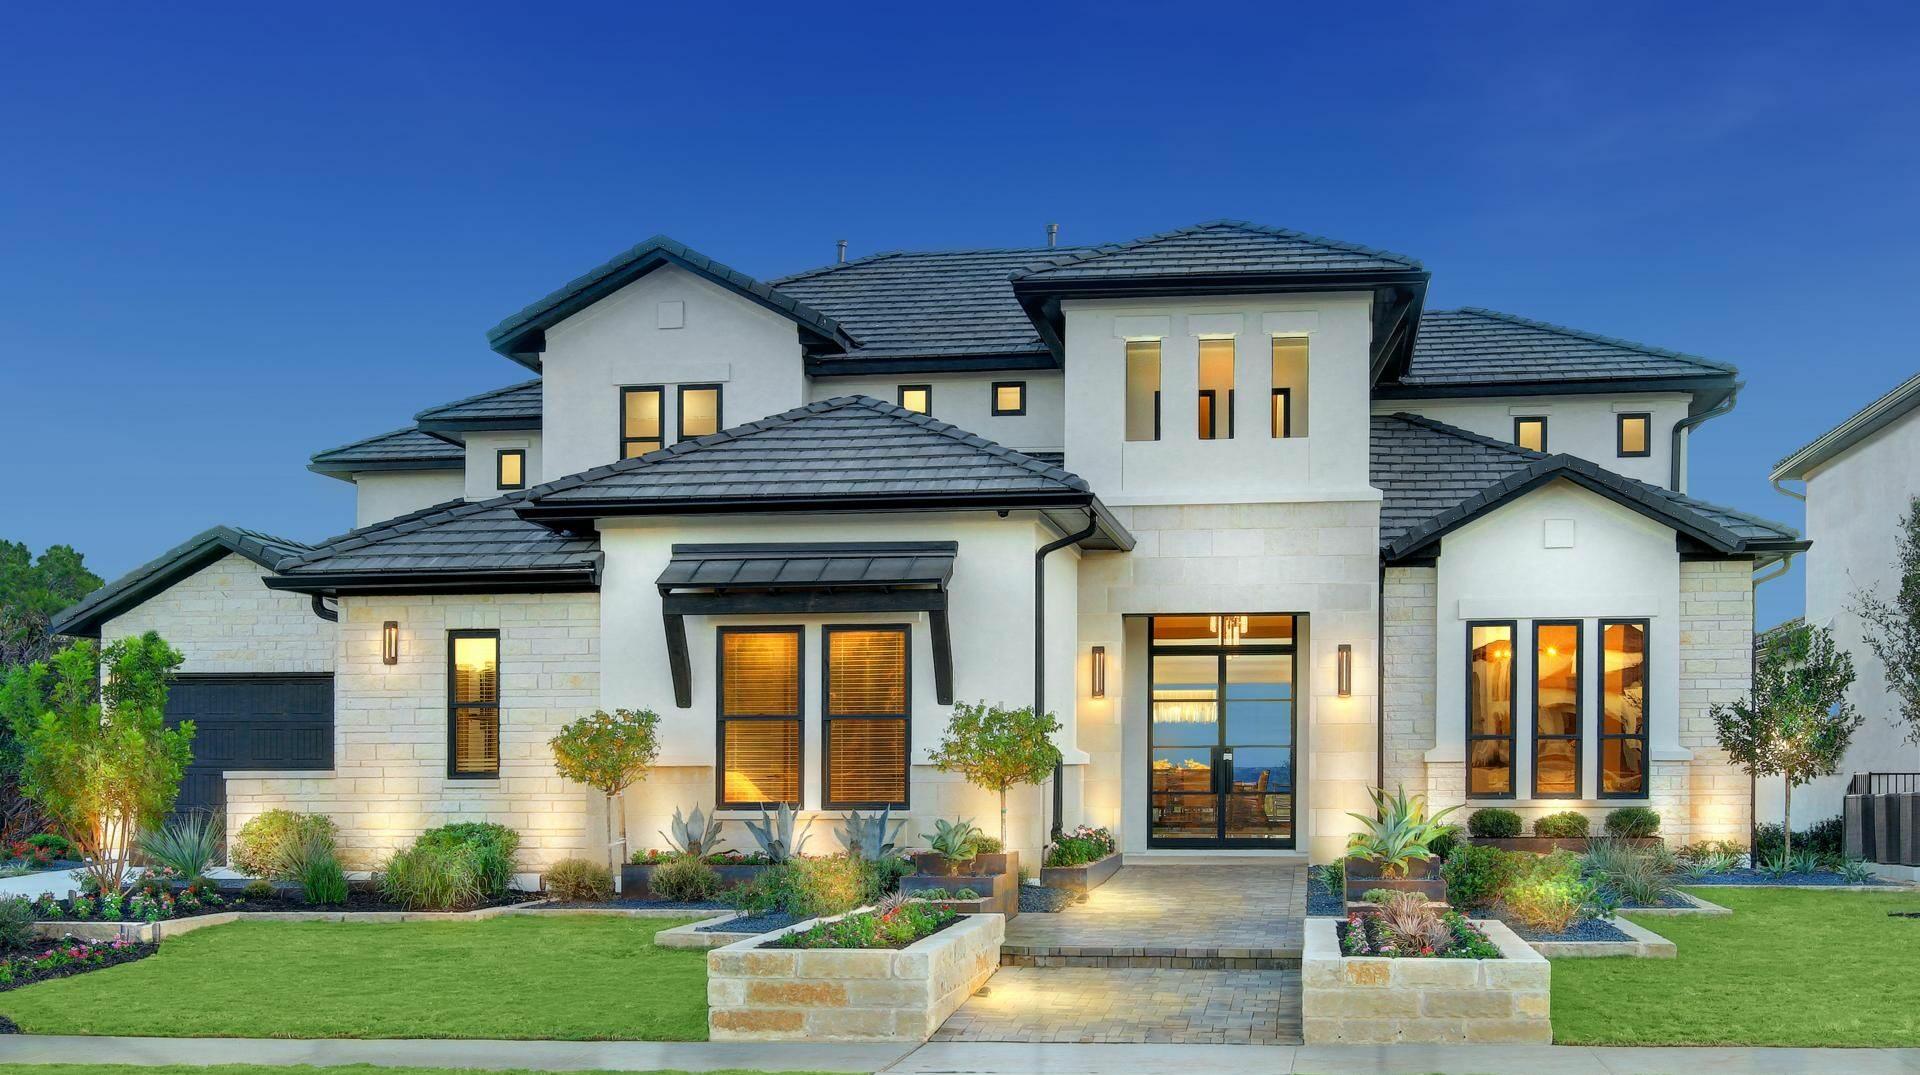 Exterior elevation of Drees Custom Homes new construction home in Pinehurst, TX